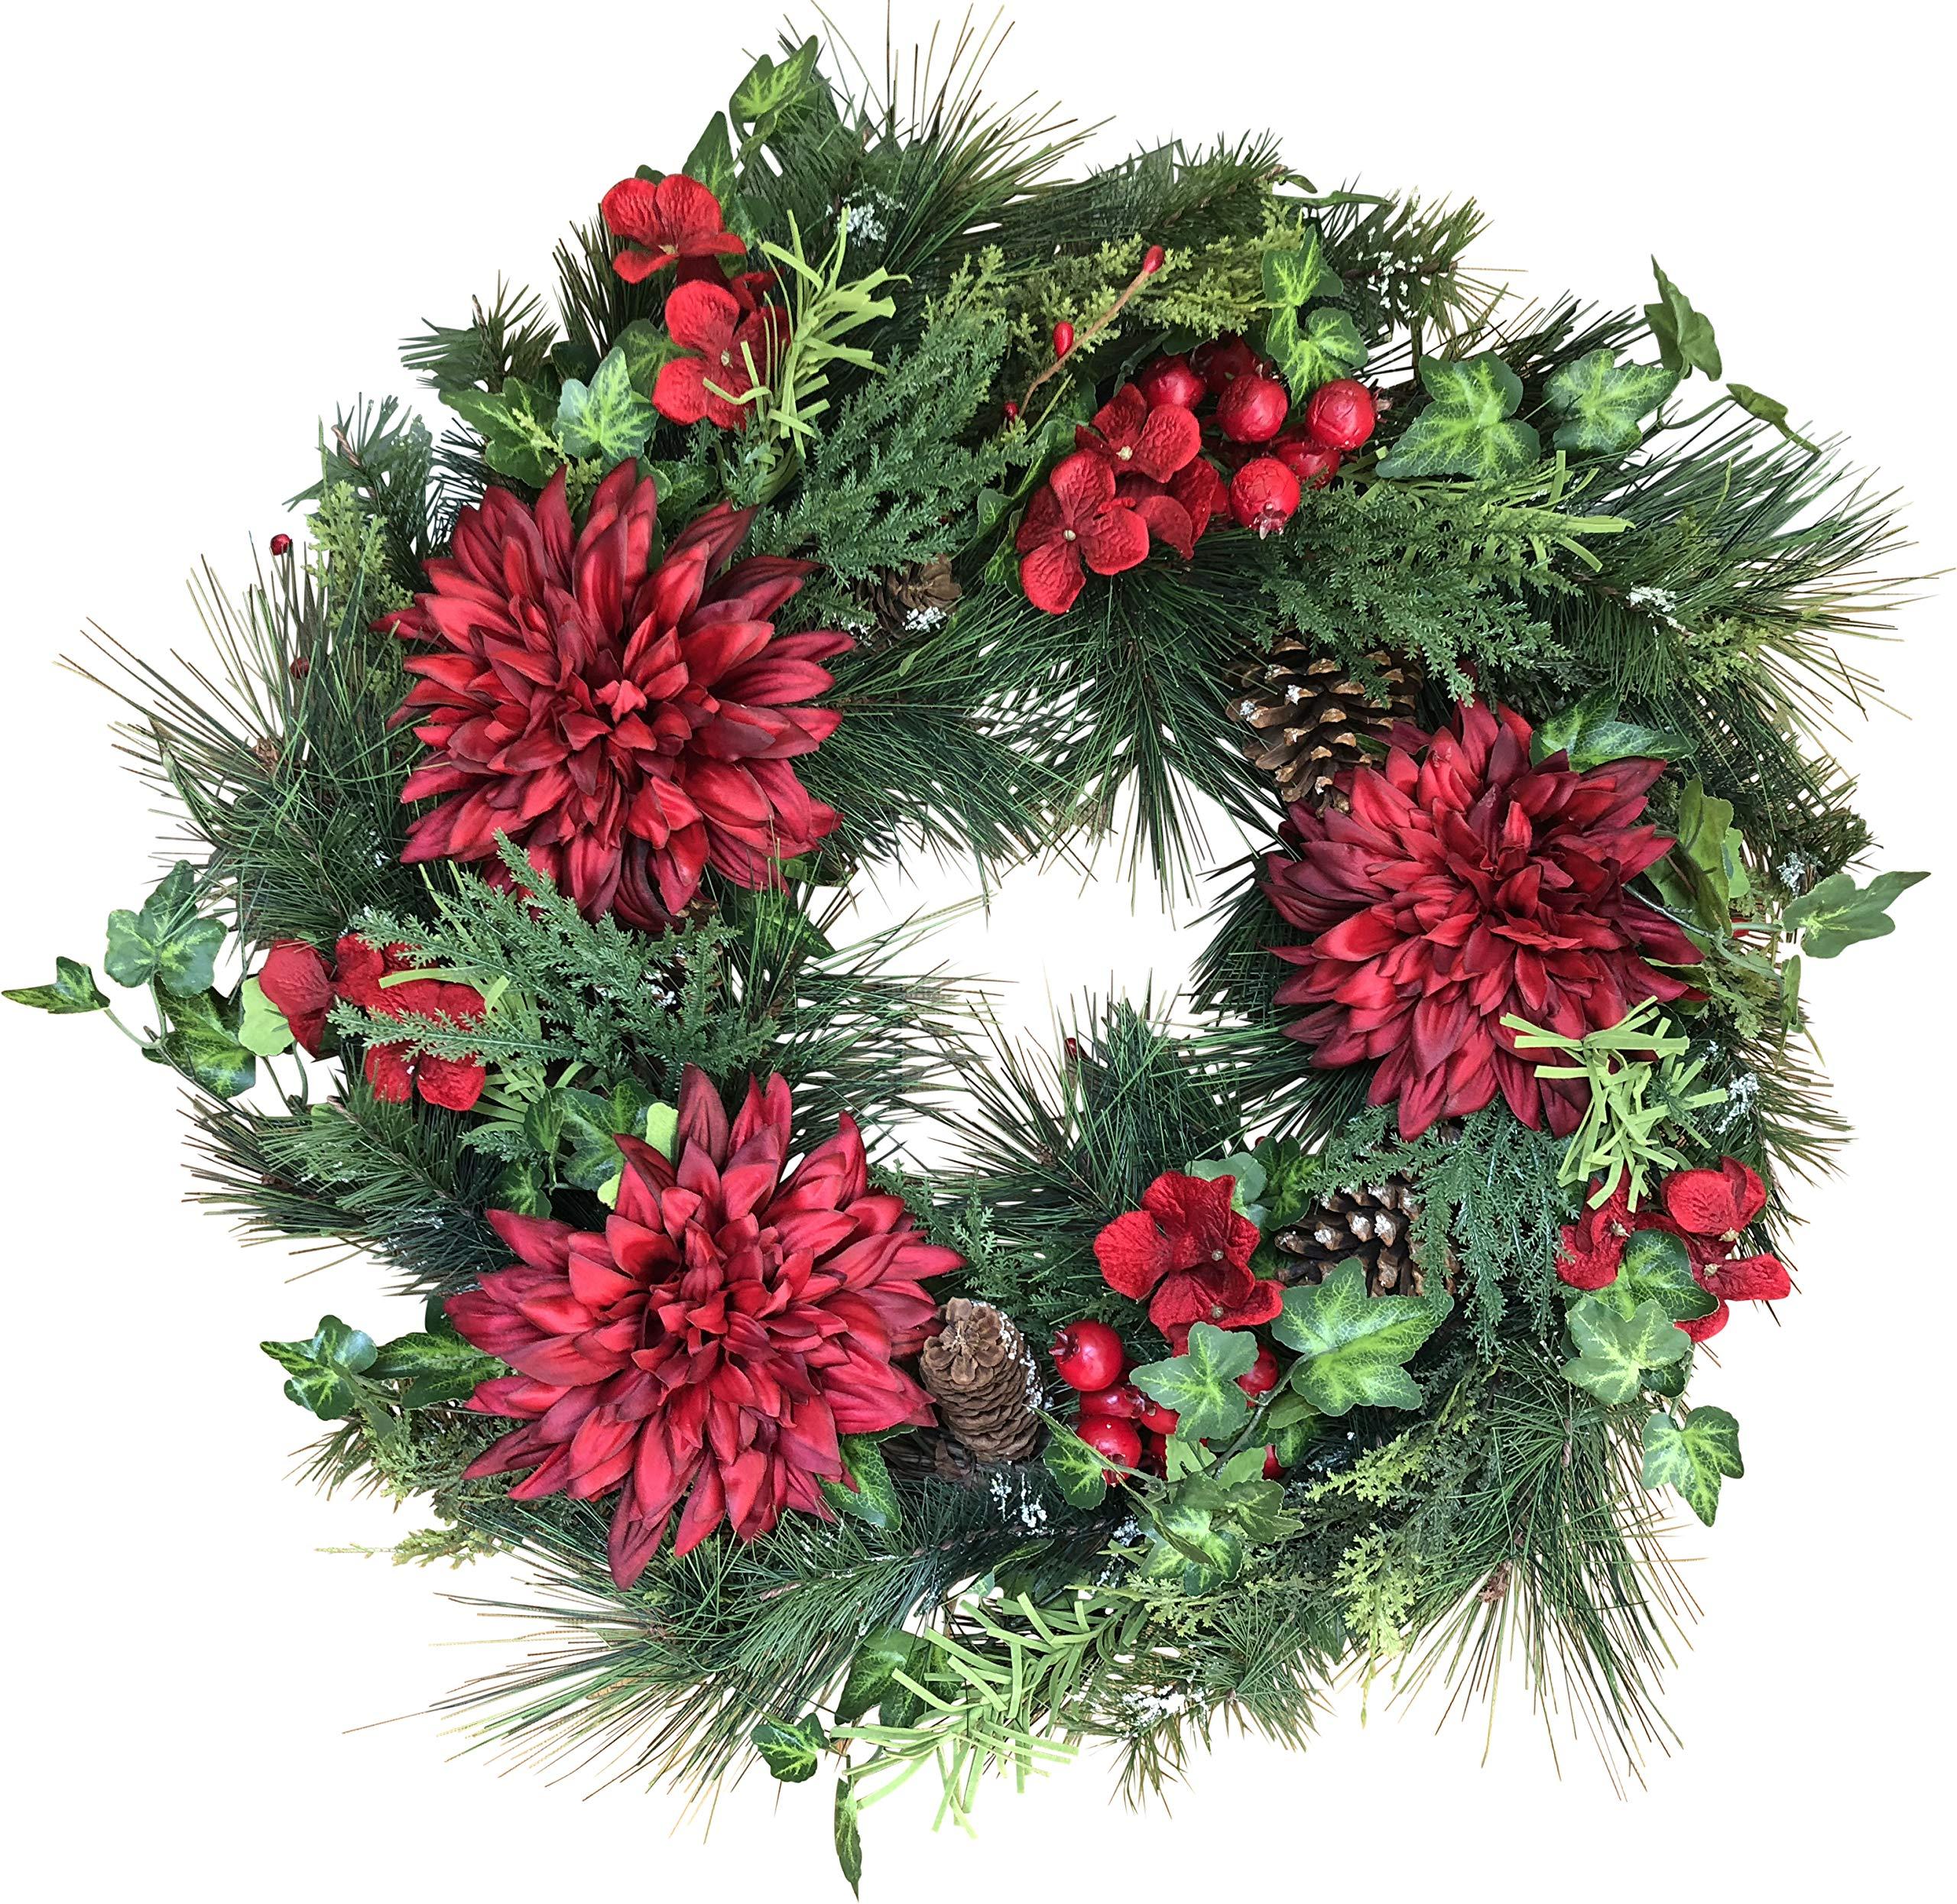 The Wreath Depot Jasper Winter Wreath, 22 Inches, Stunning Full Winter Wreath Design, Gift Box Included